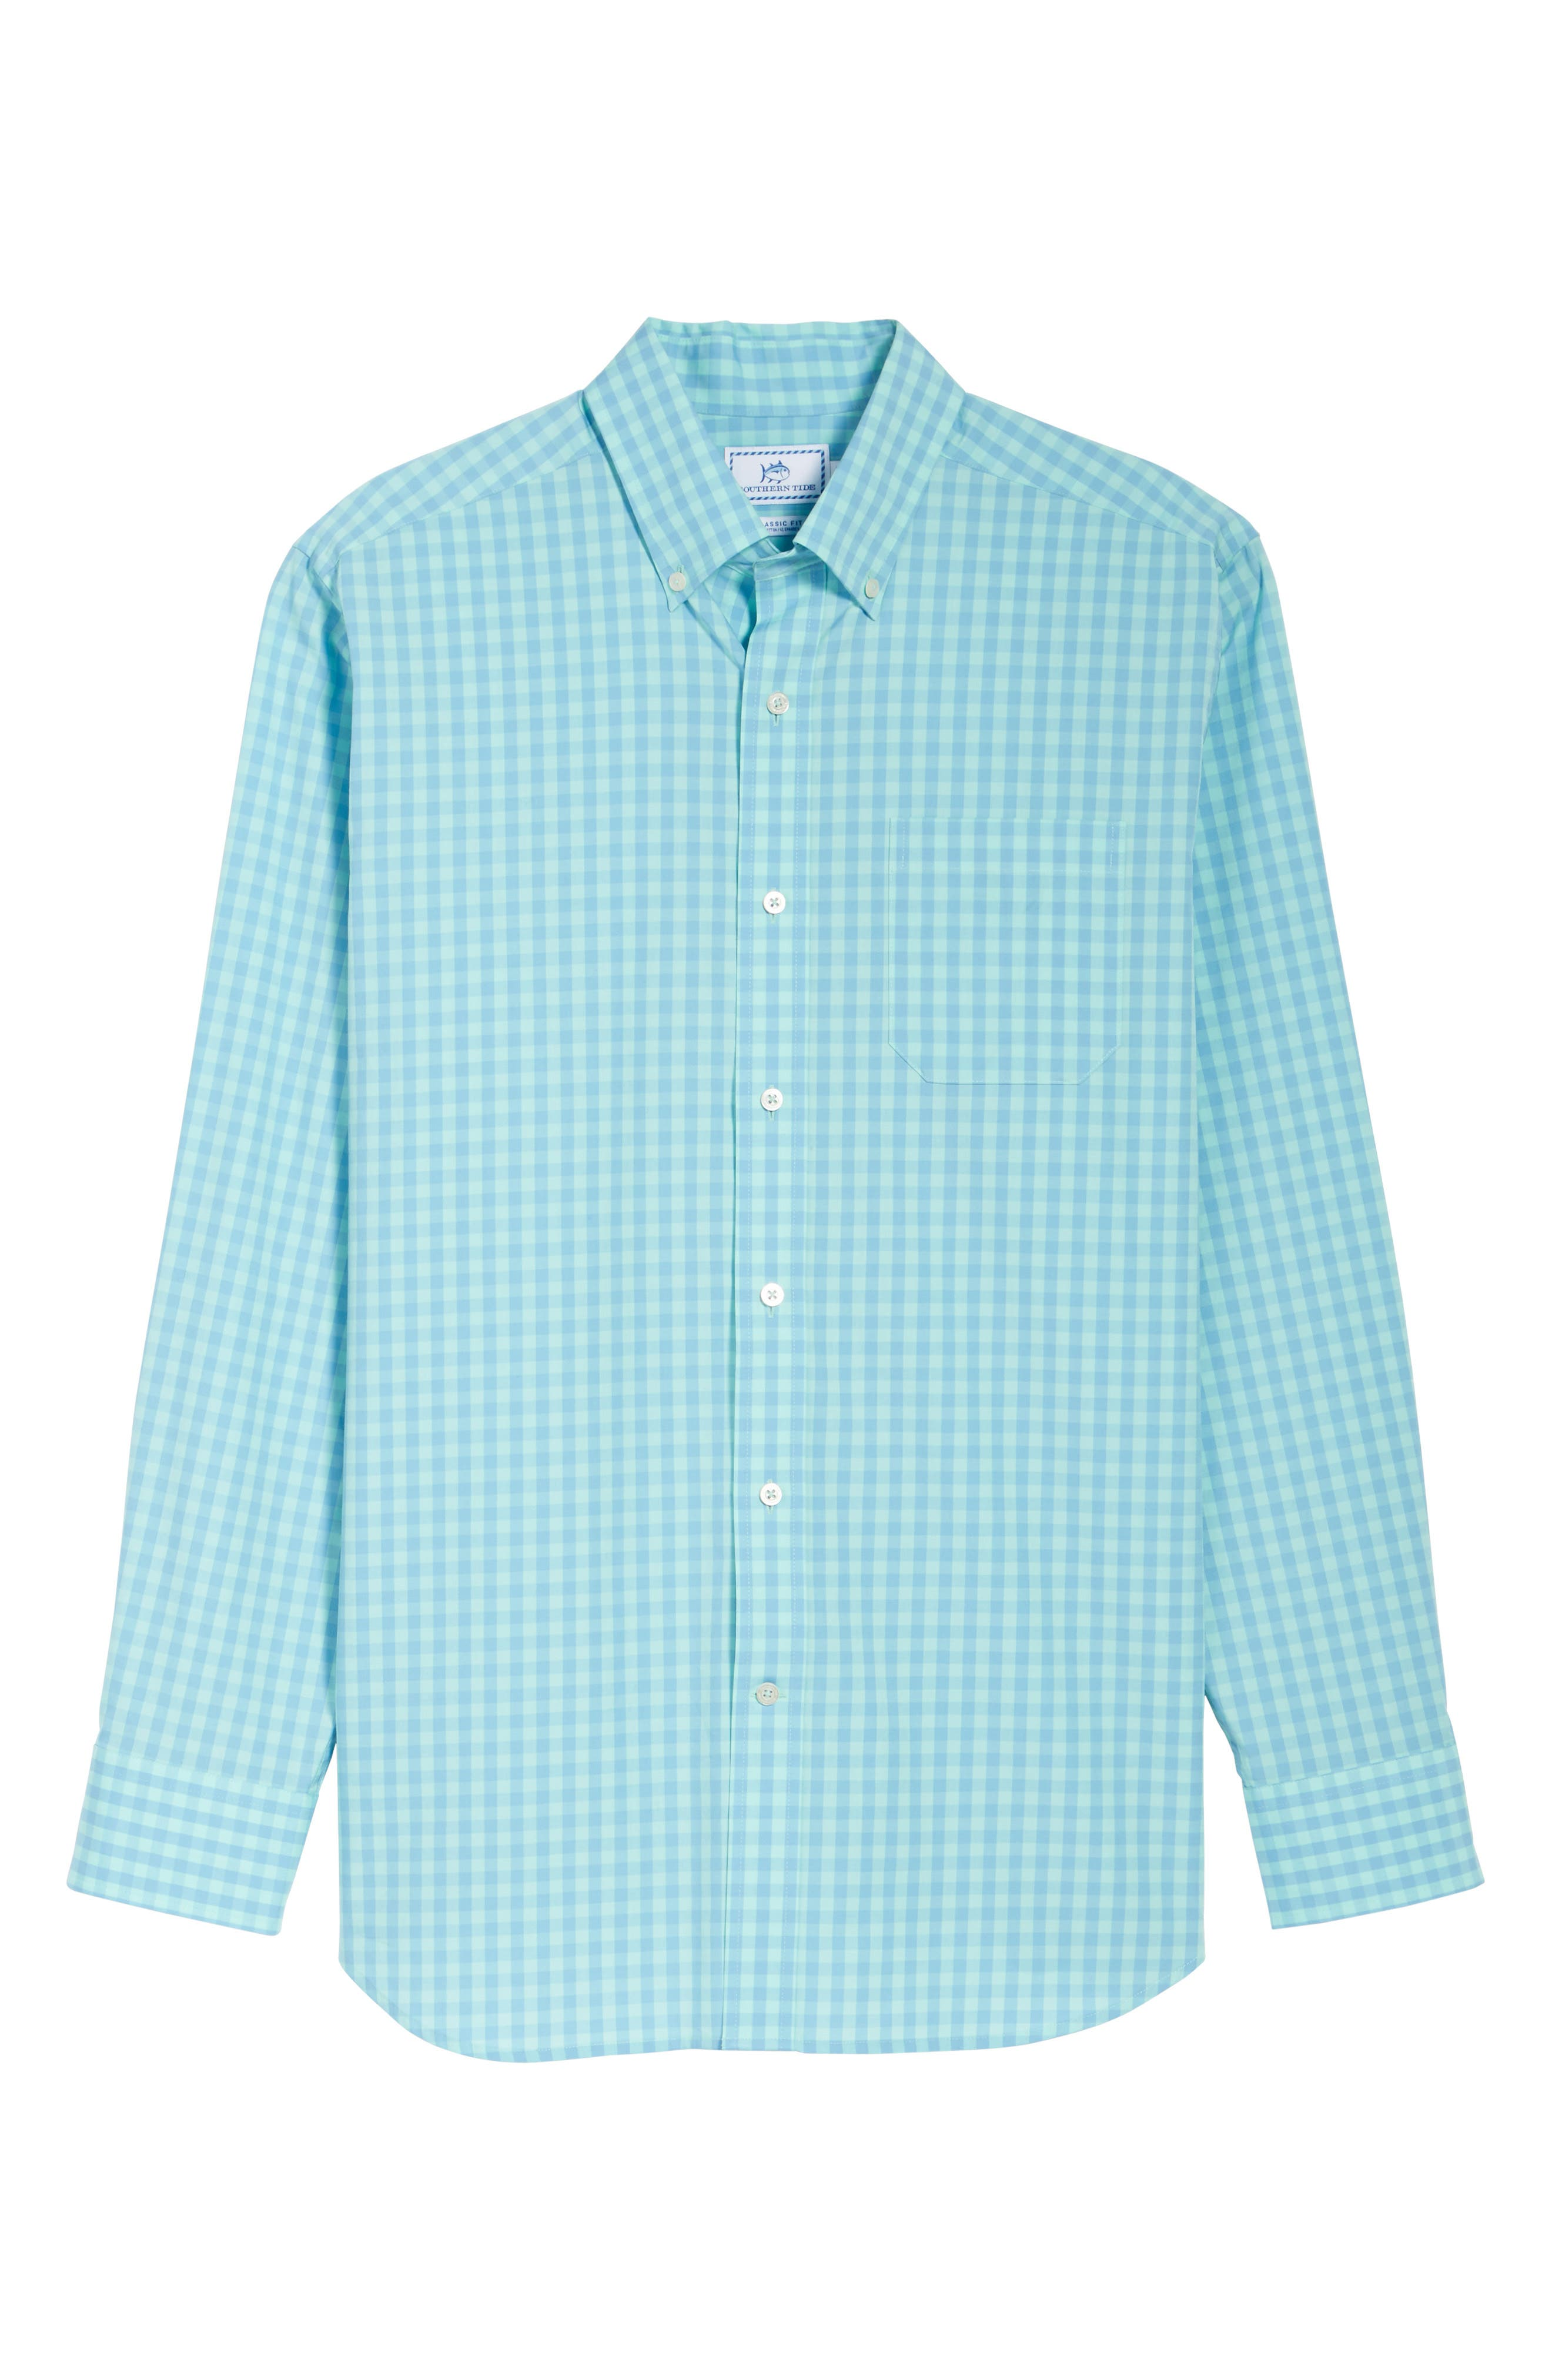 Getaway Gingham Classic Fit Sport Shirt,                             Alternate thumbnail 6, color,                             476